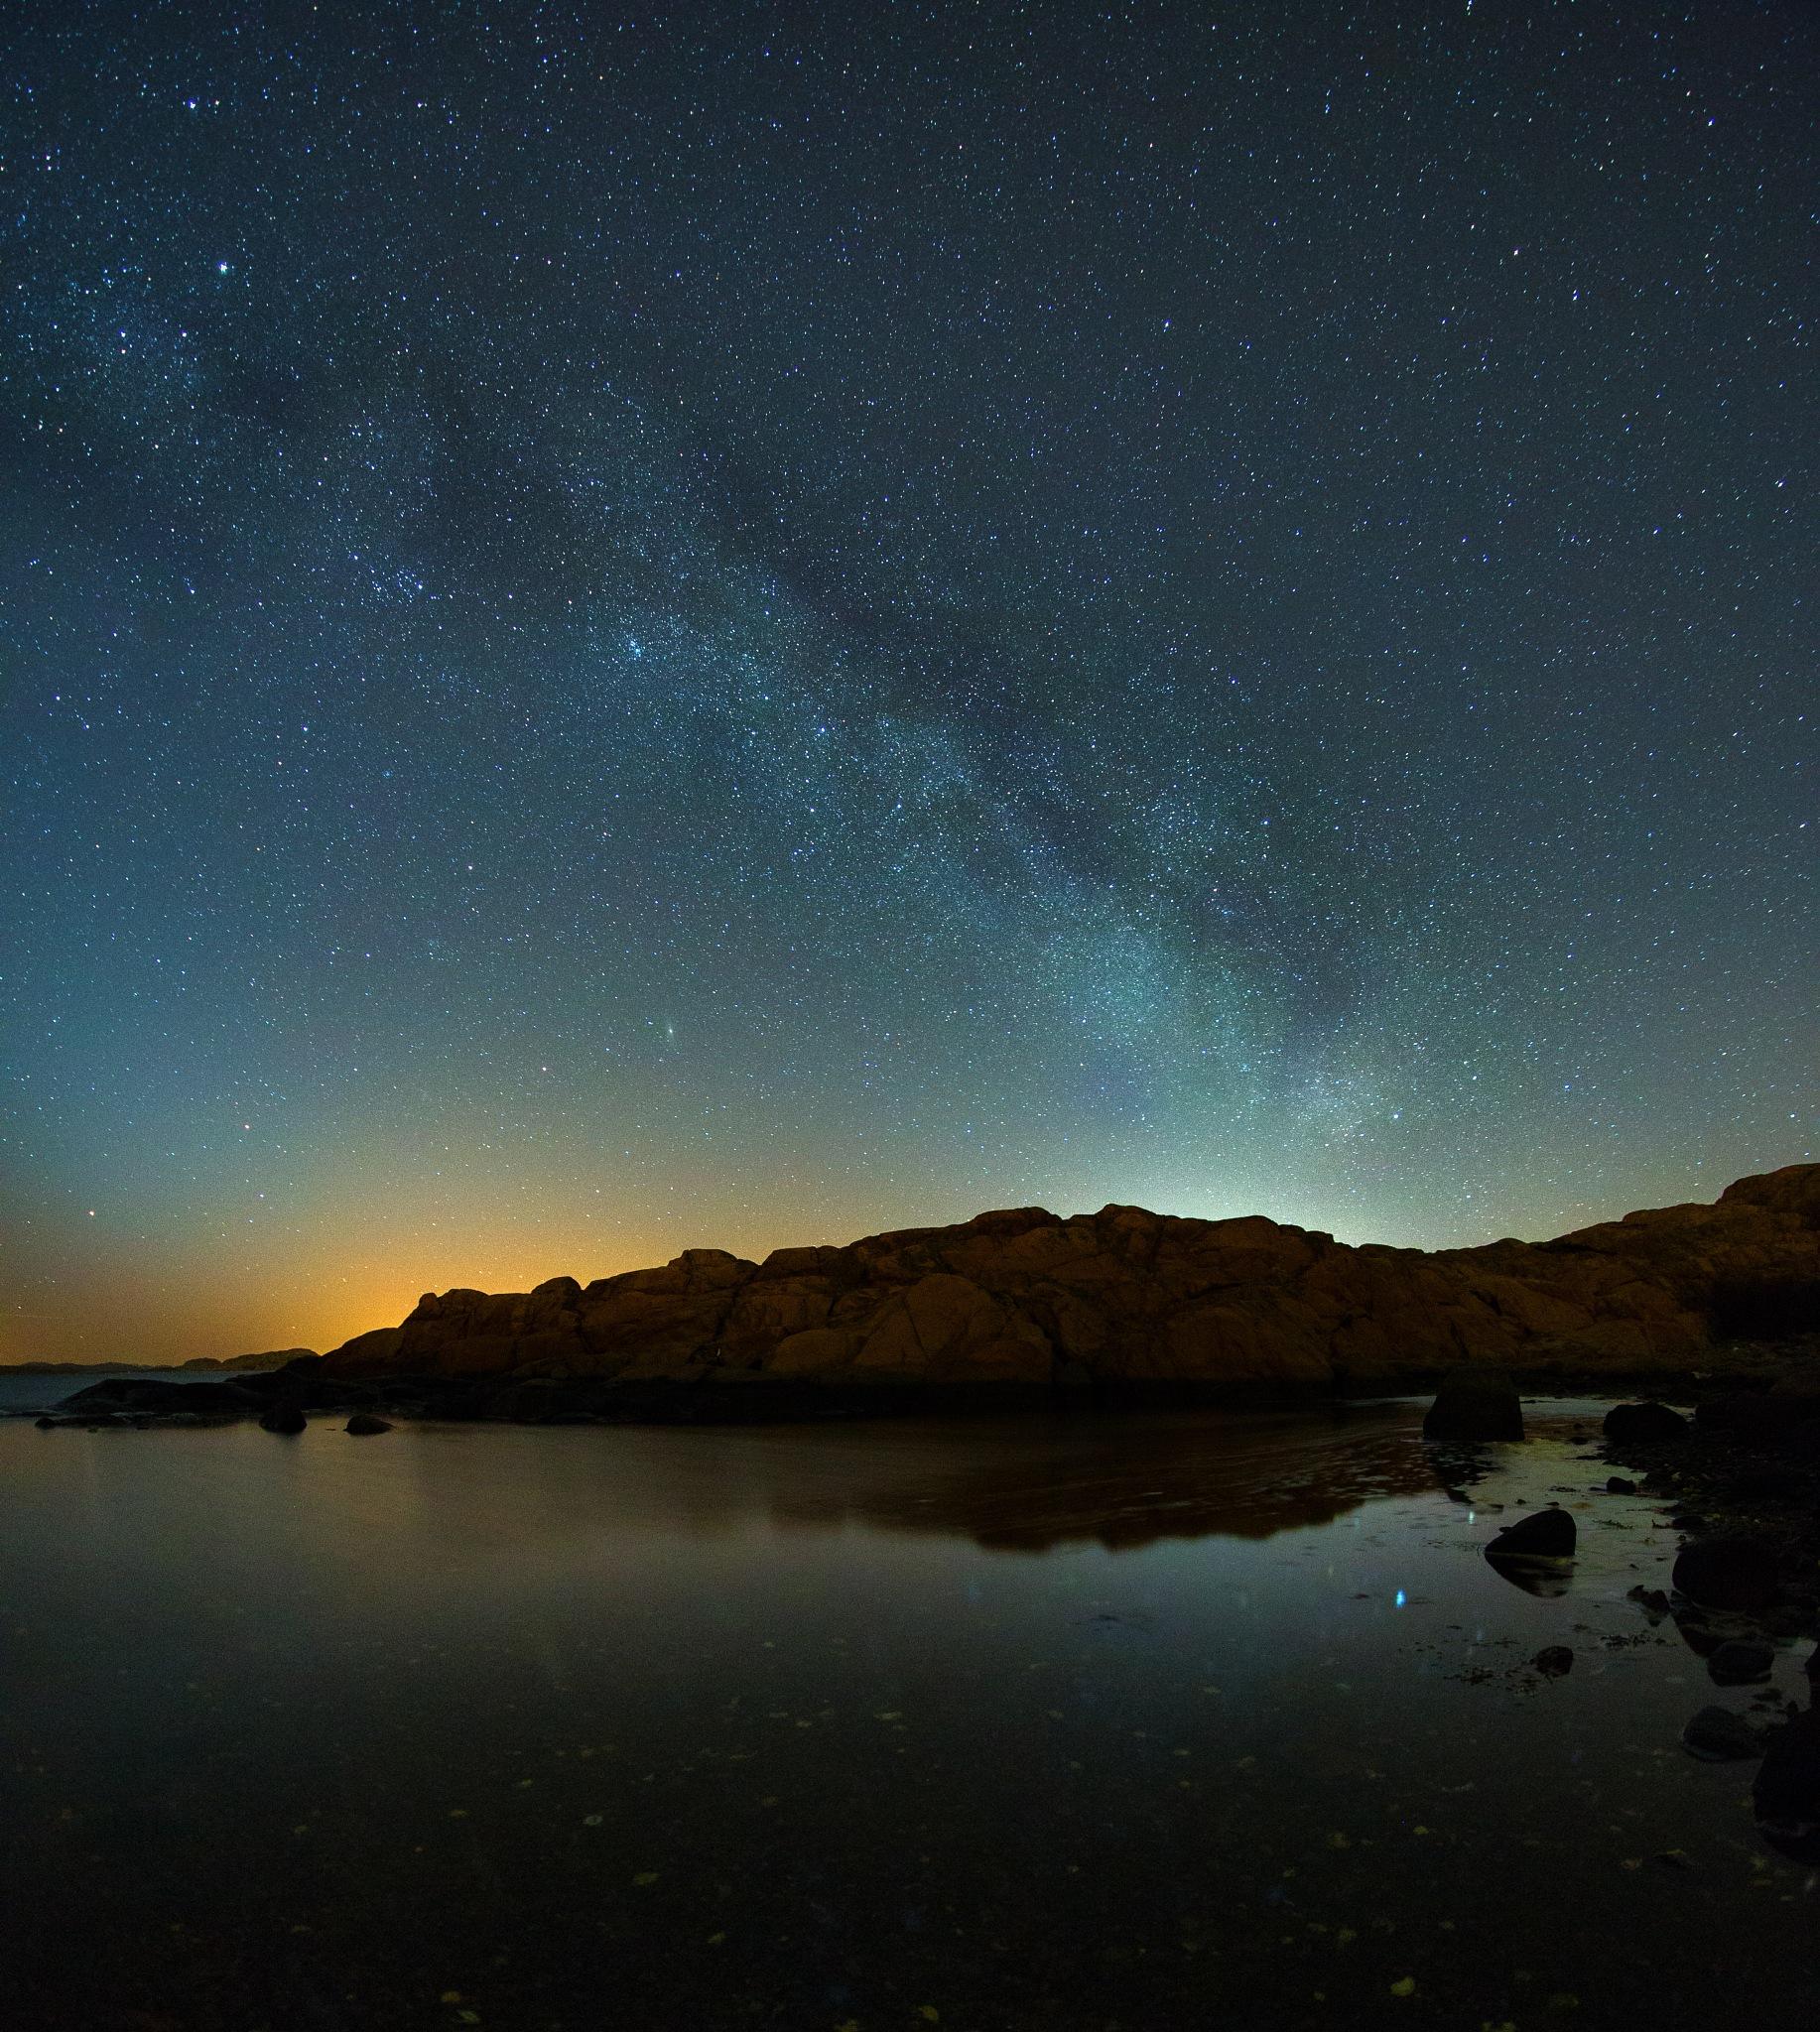 Night at the bay by Pär Ohlson